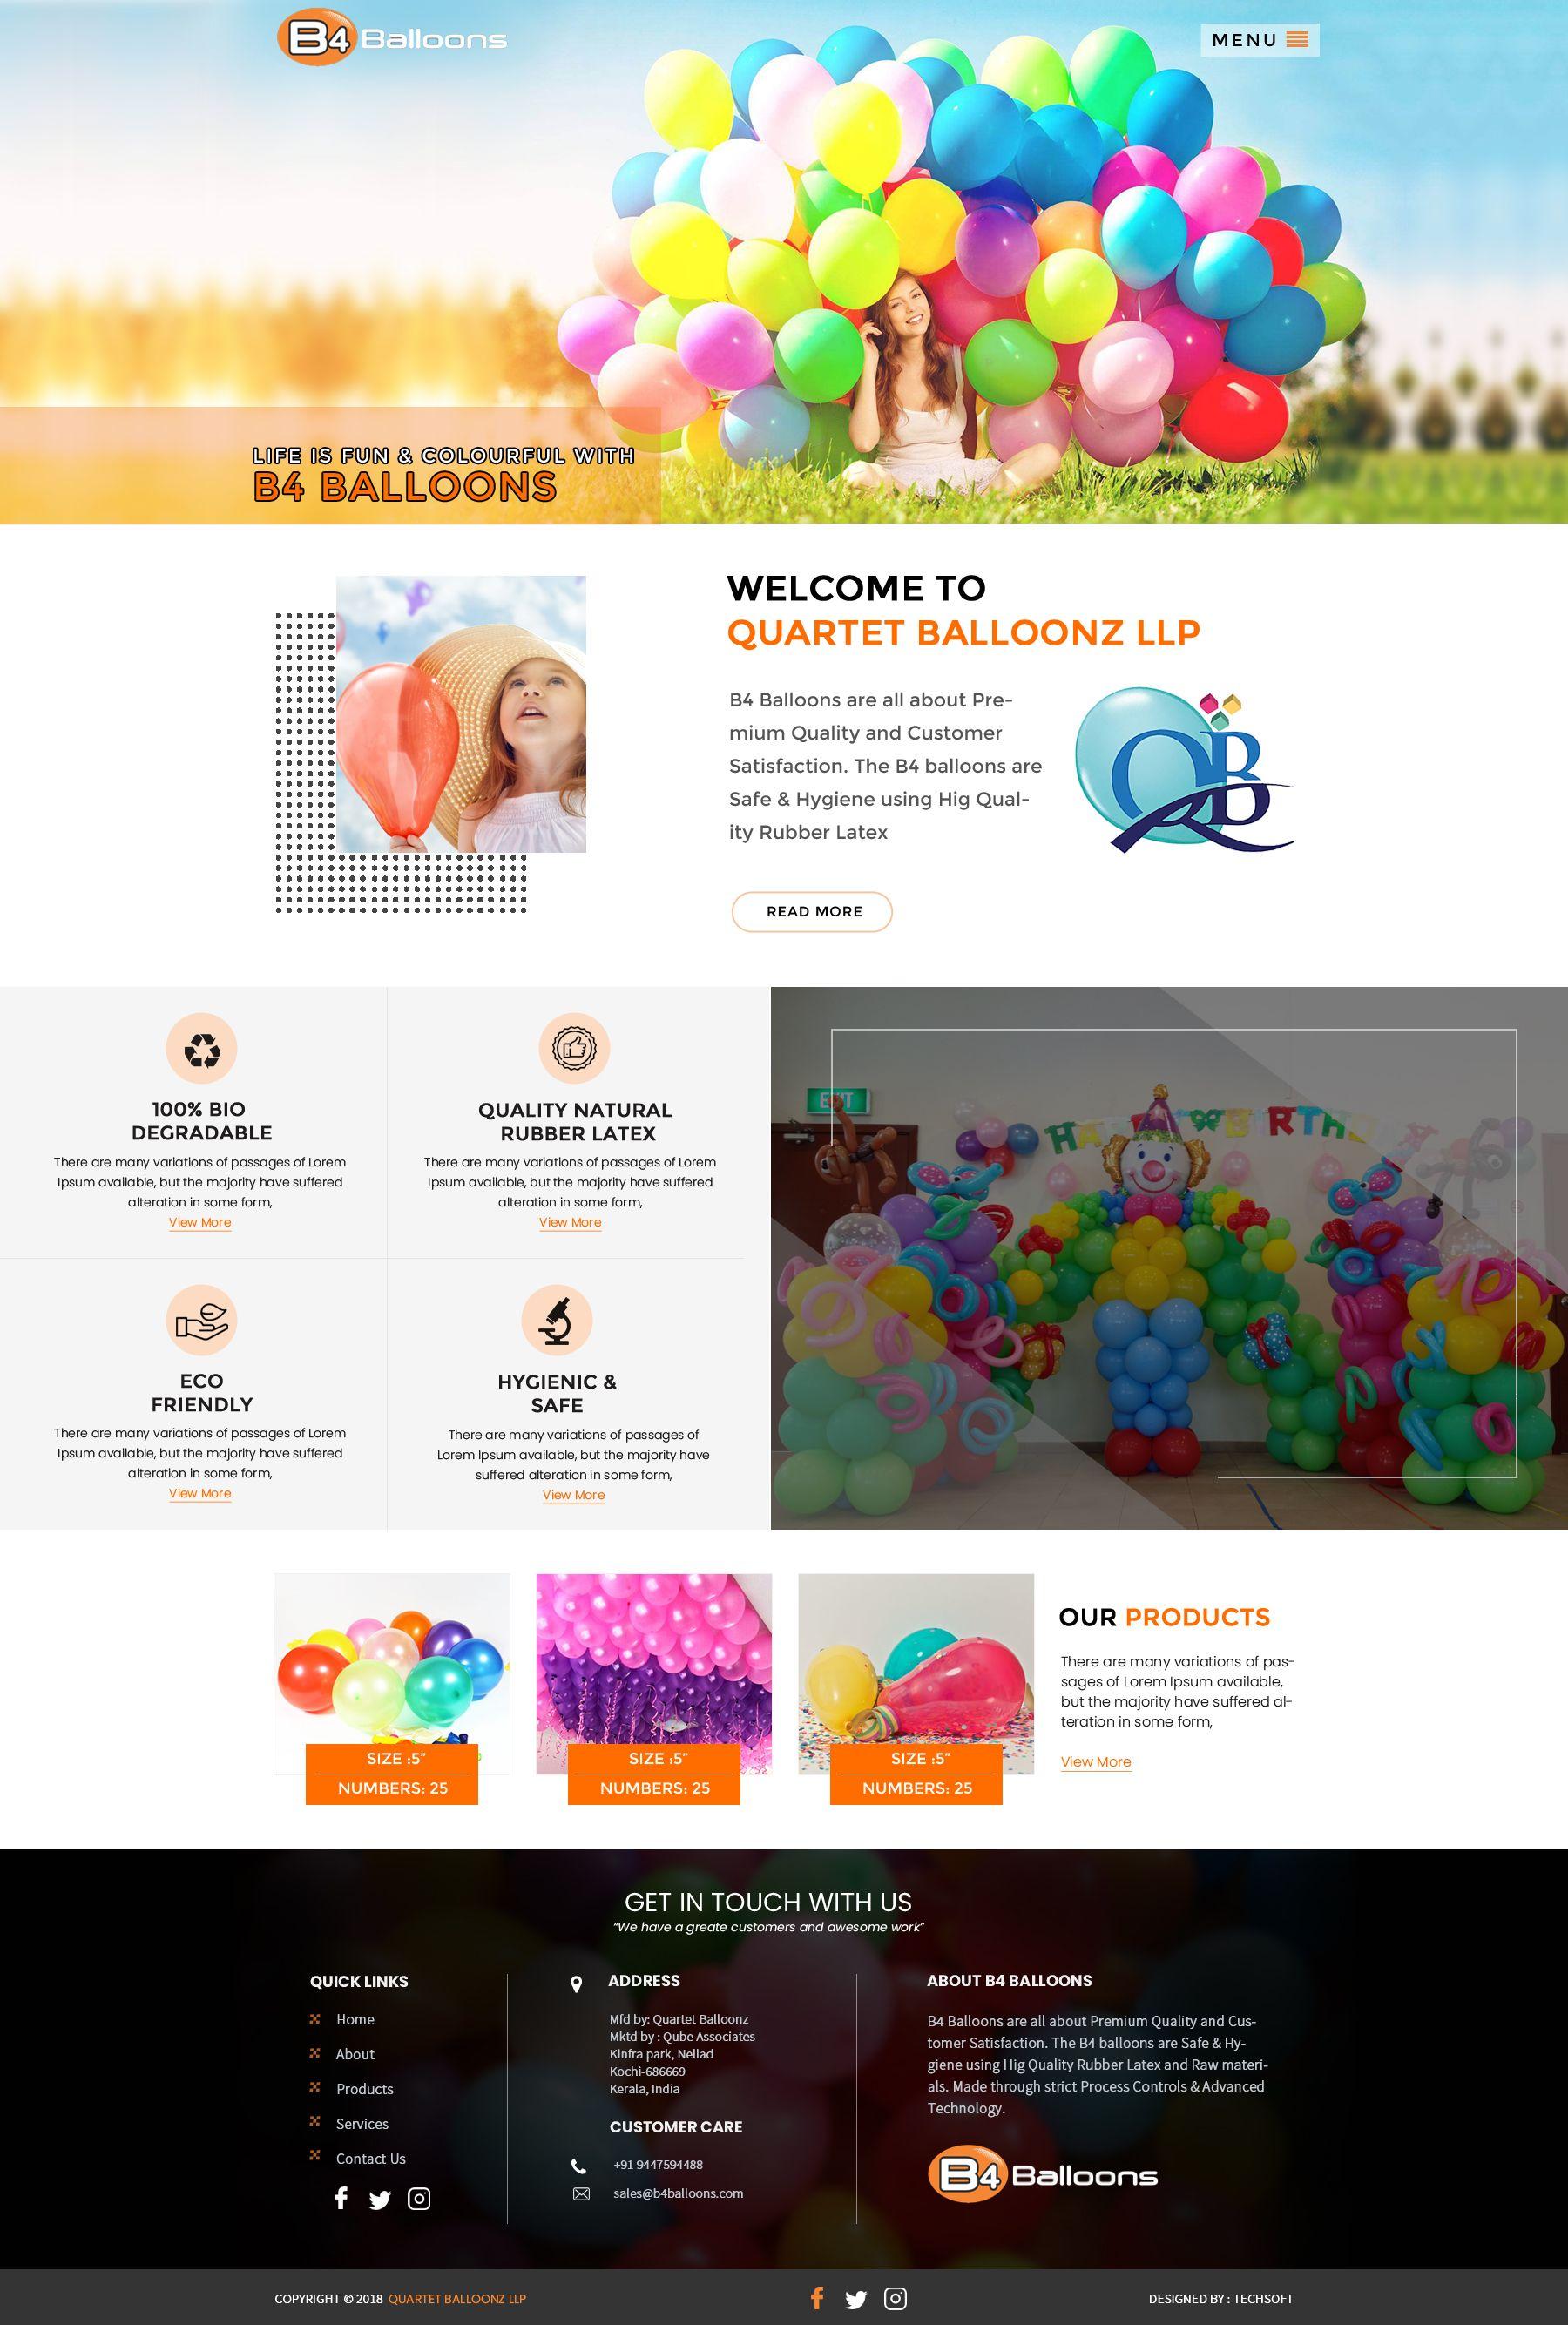 Web Designing Kerala Low Cost Web Designing Ernakulam Low Cost Web Designing Kochi Low Cost Web De Website Design Company Design Company Web Design Company